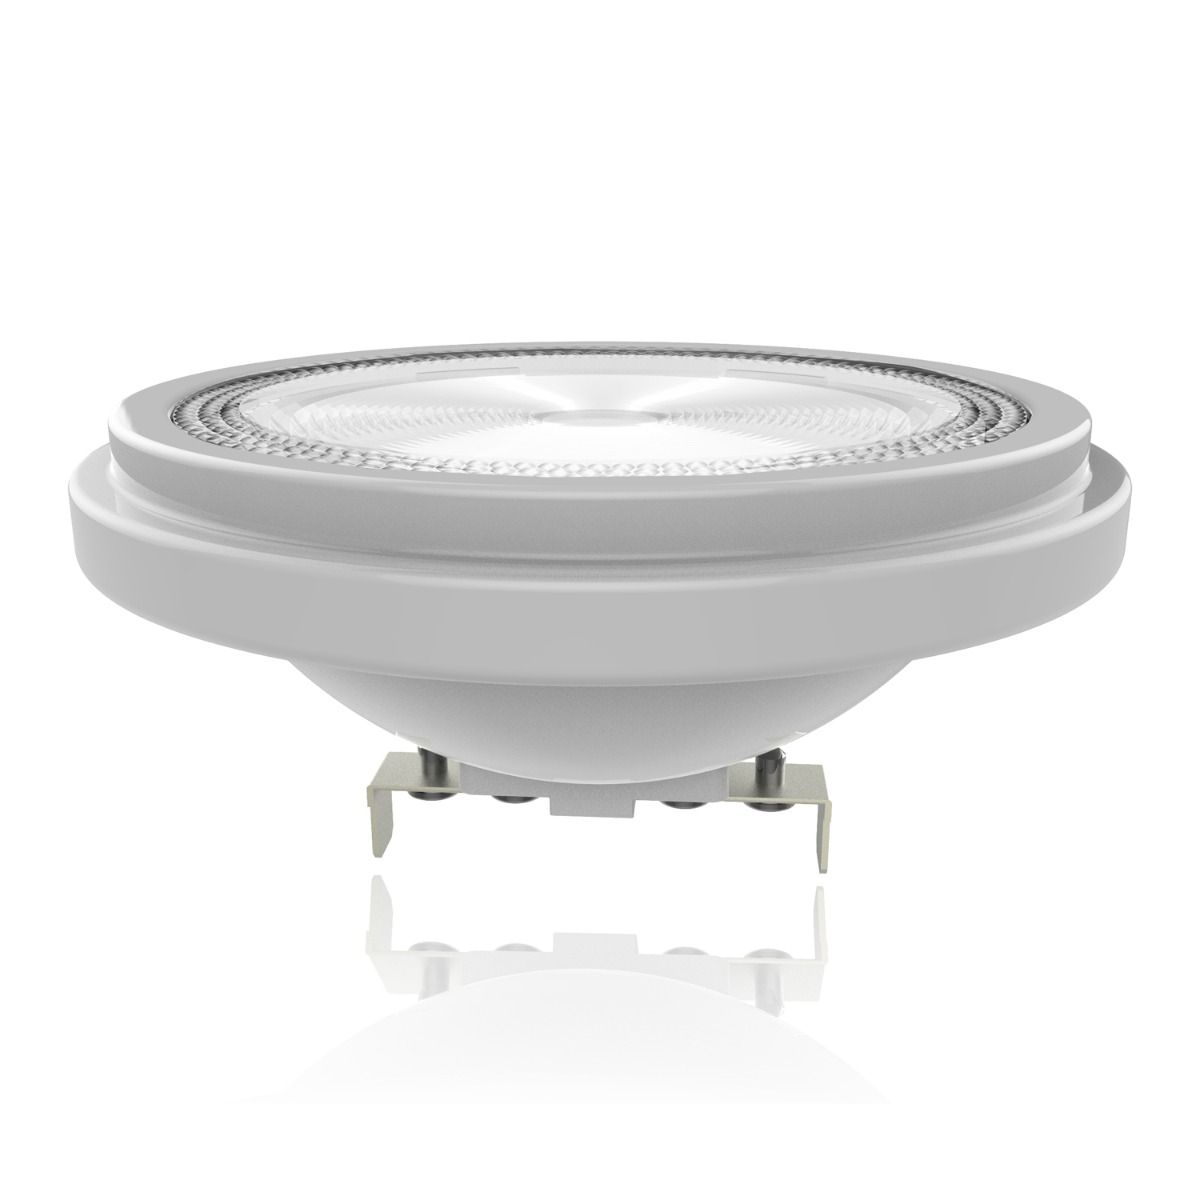 Noxion Lucent LED Spot AR111 G53 12V 11.5W 930 40D   Dimmable - Best Colour Rendering - Replaces 75W